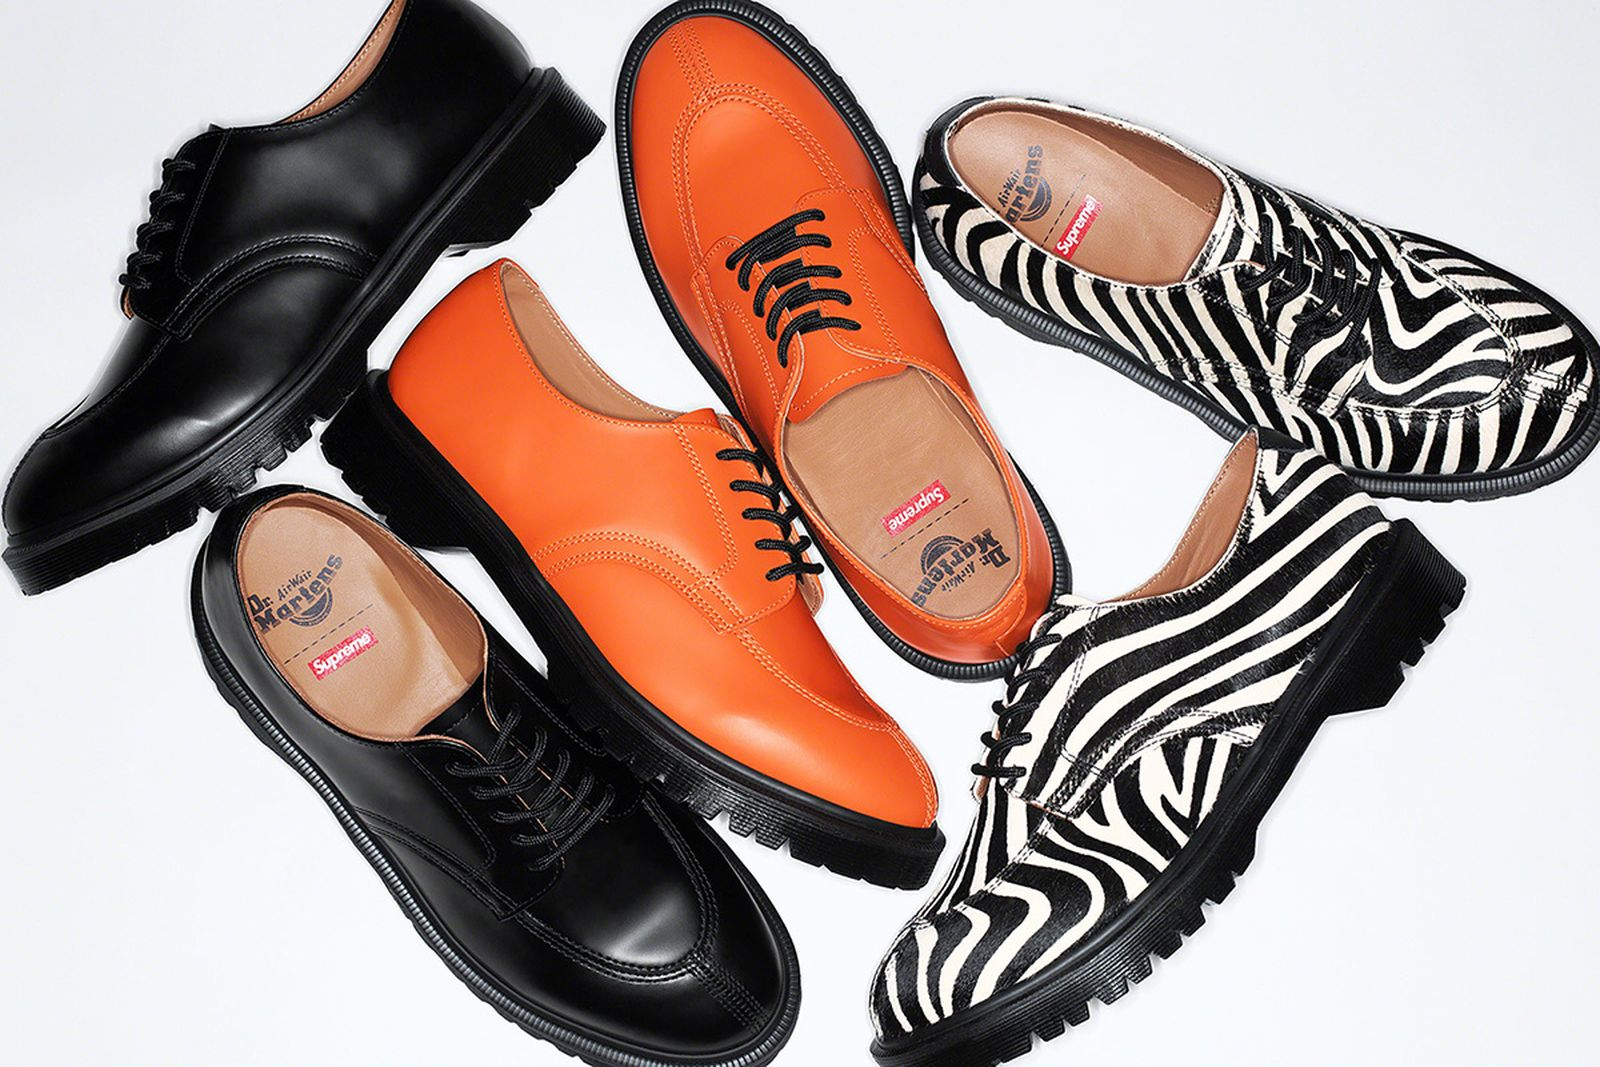 supreme-dr-martens-5-eye-shoe-release-date-price-11